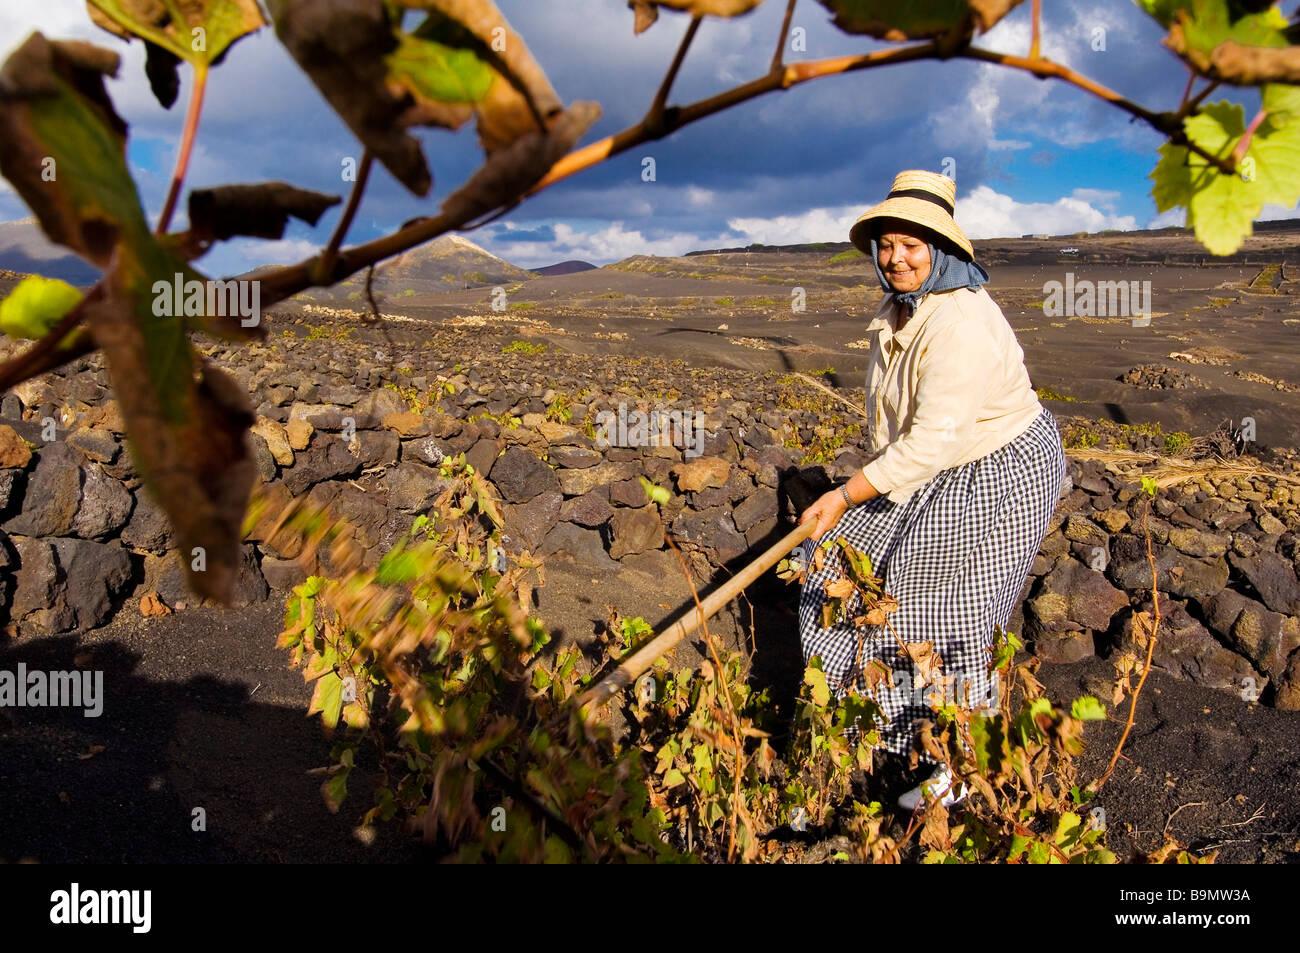 Spain, Canary Islands, Lanzarote Island, Biosphere reserve, La Geria, peasant working in the vineyards growing on - Stock Image